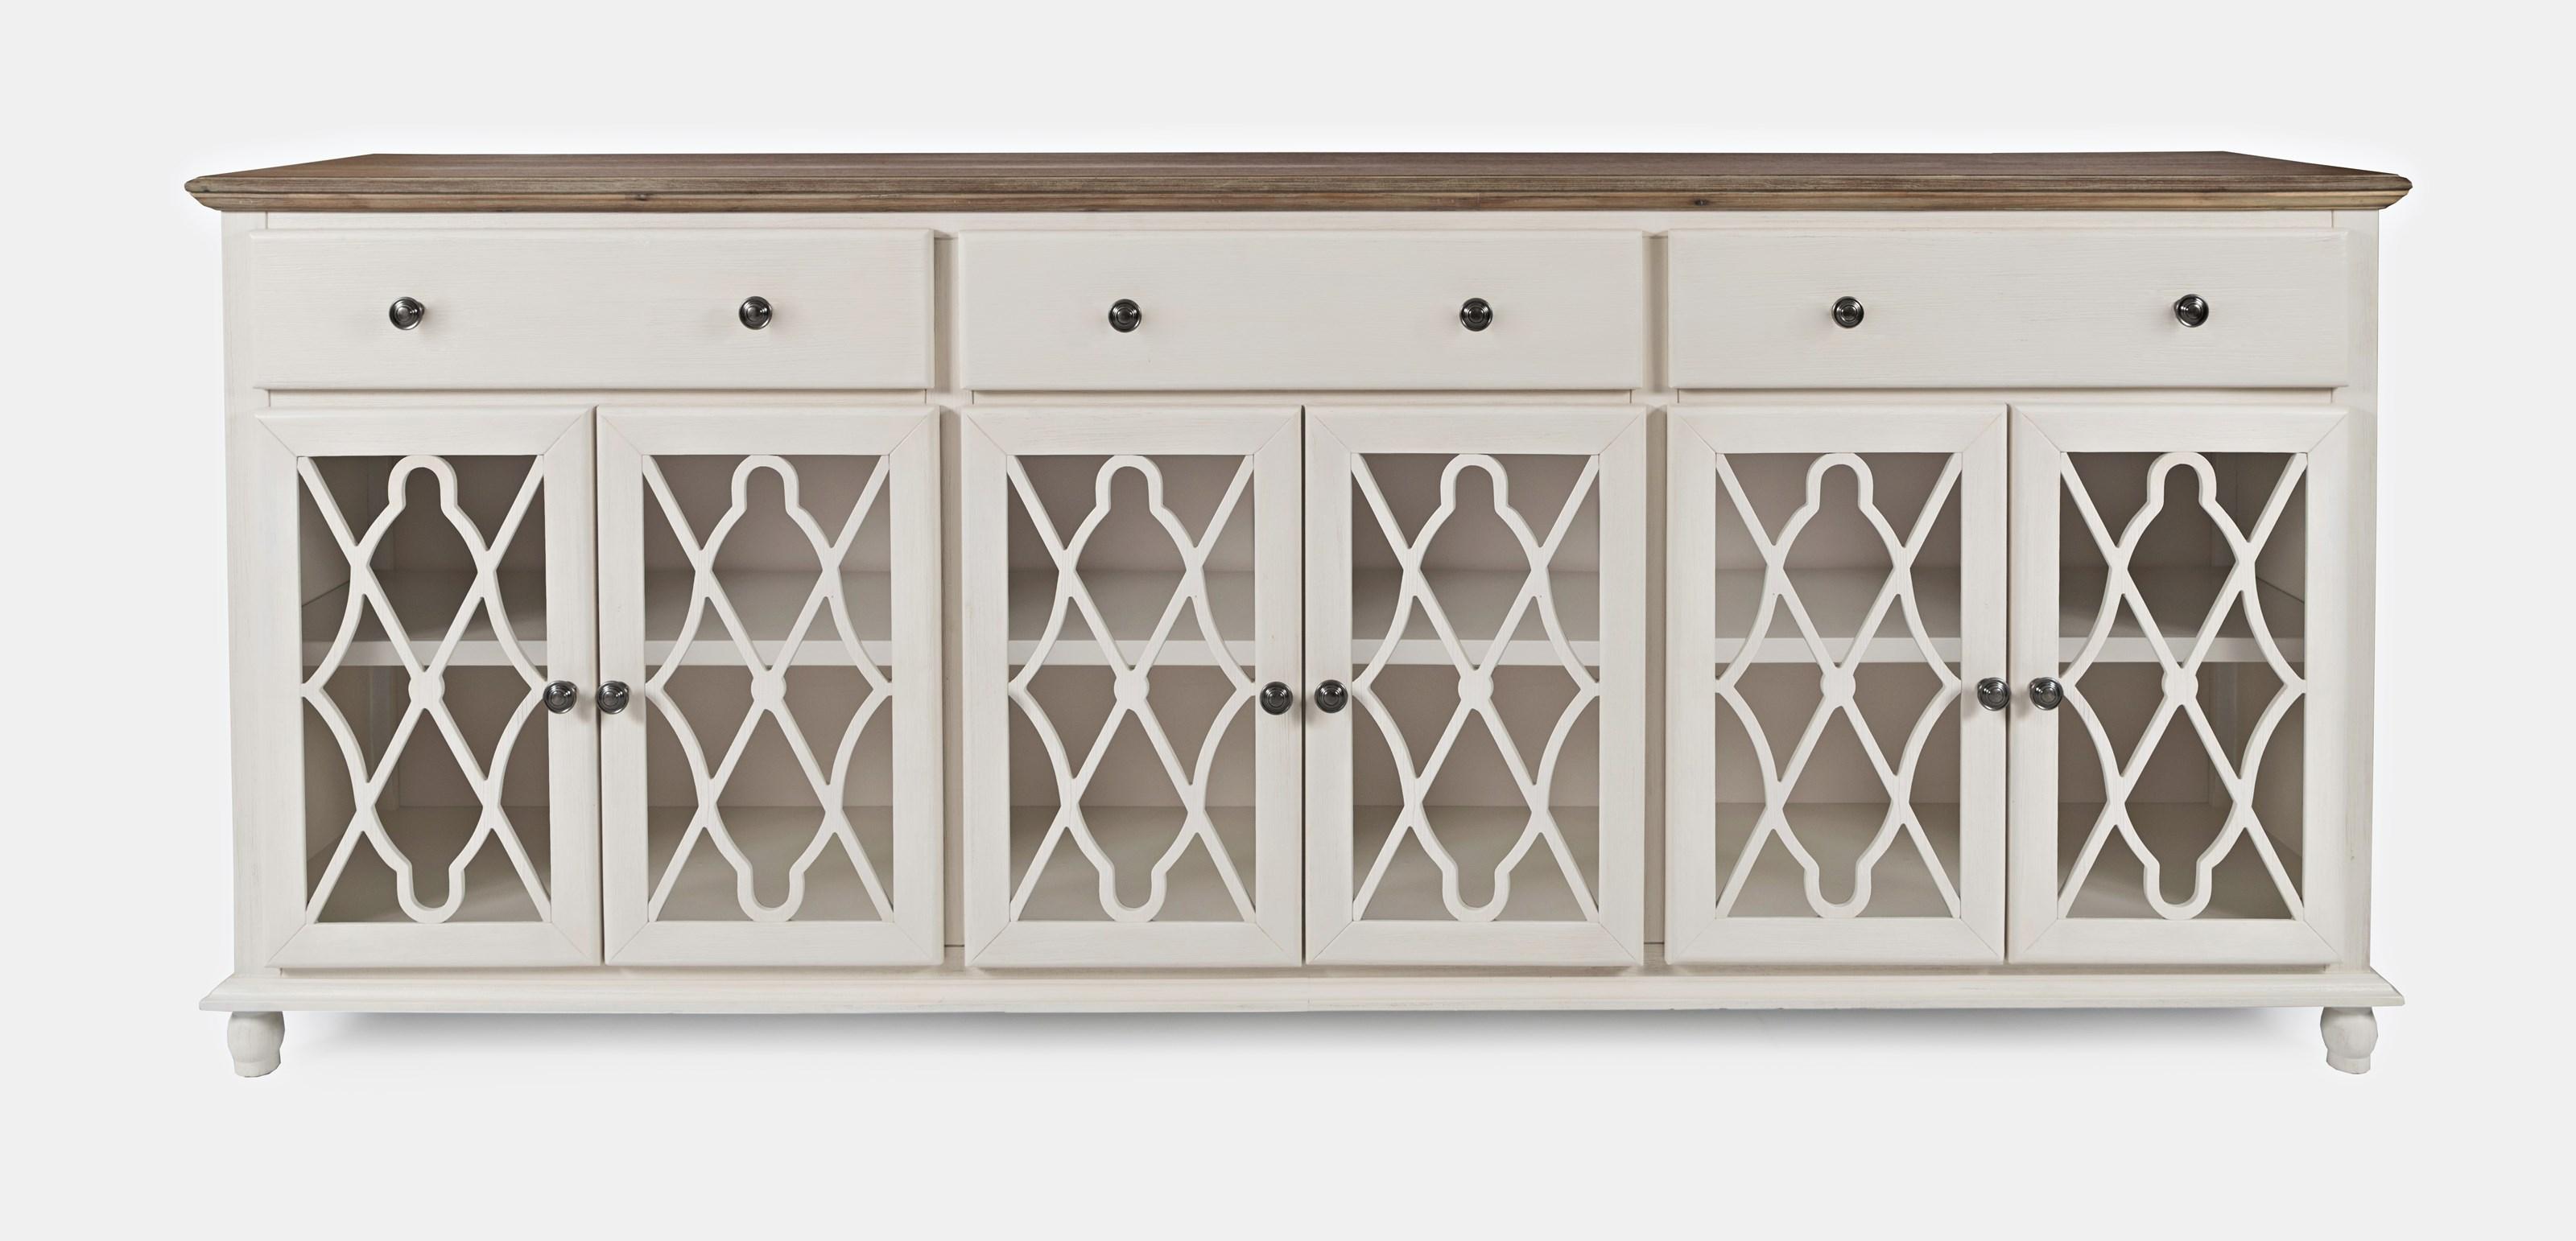 Aurora Hills 6-Door Accent Chest by Jofran at Furniture and ApplianceMart